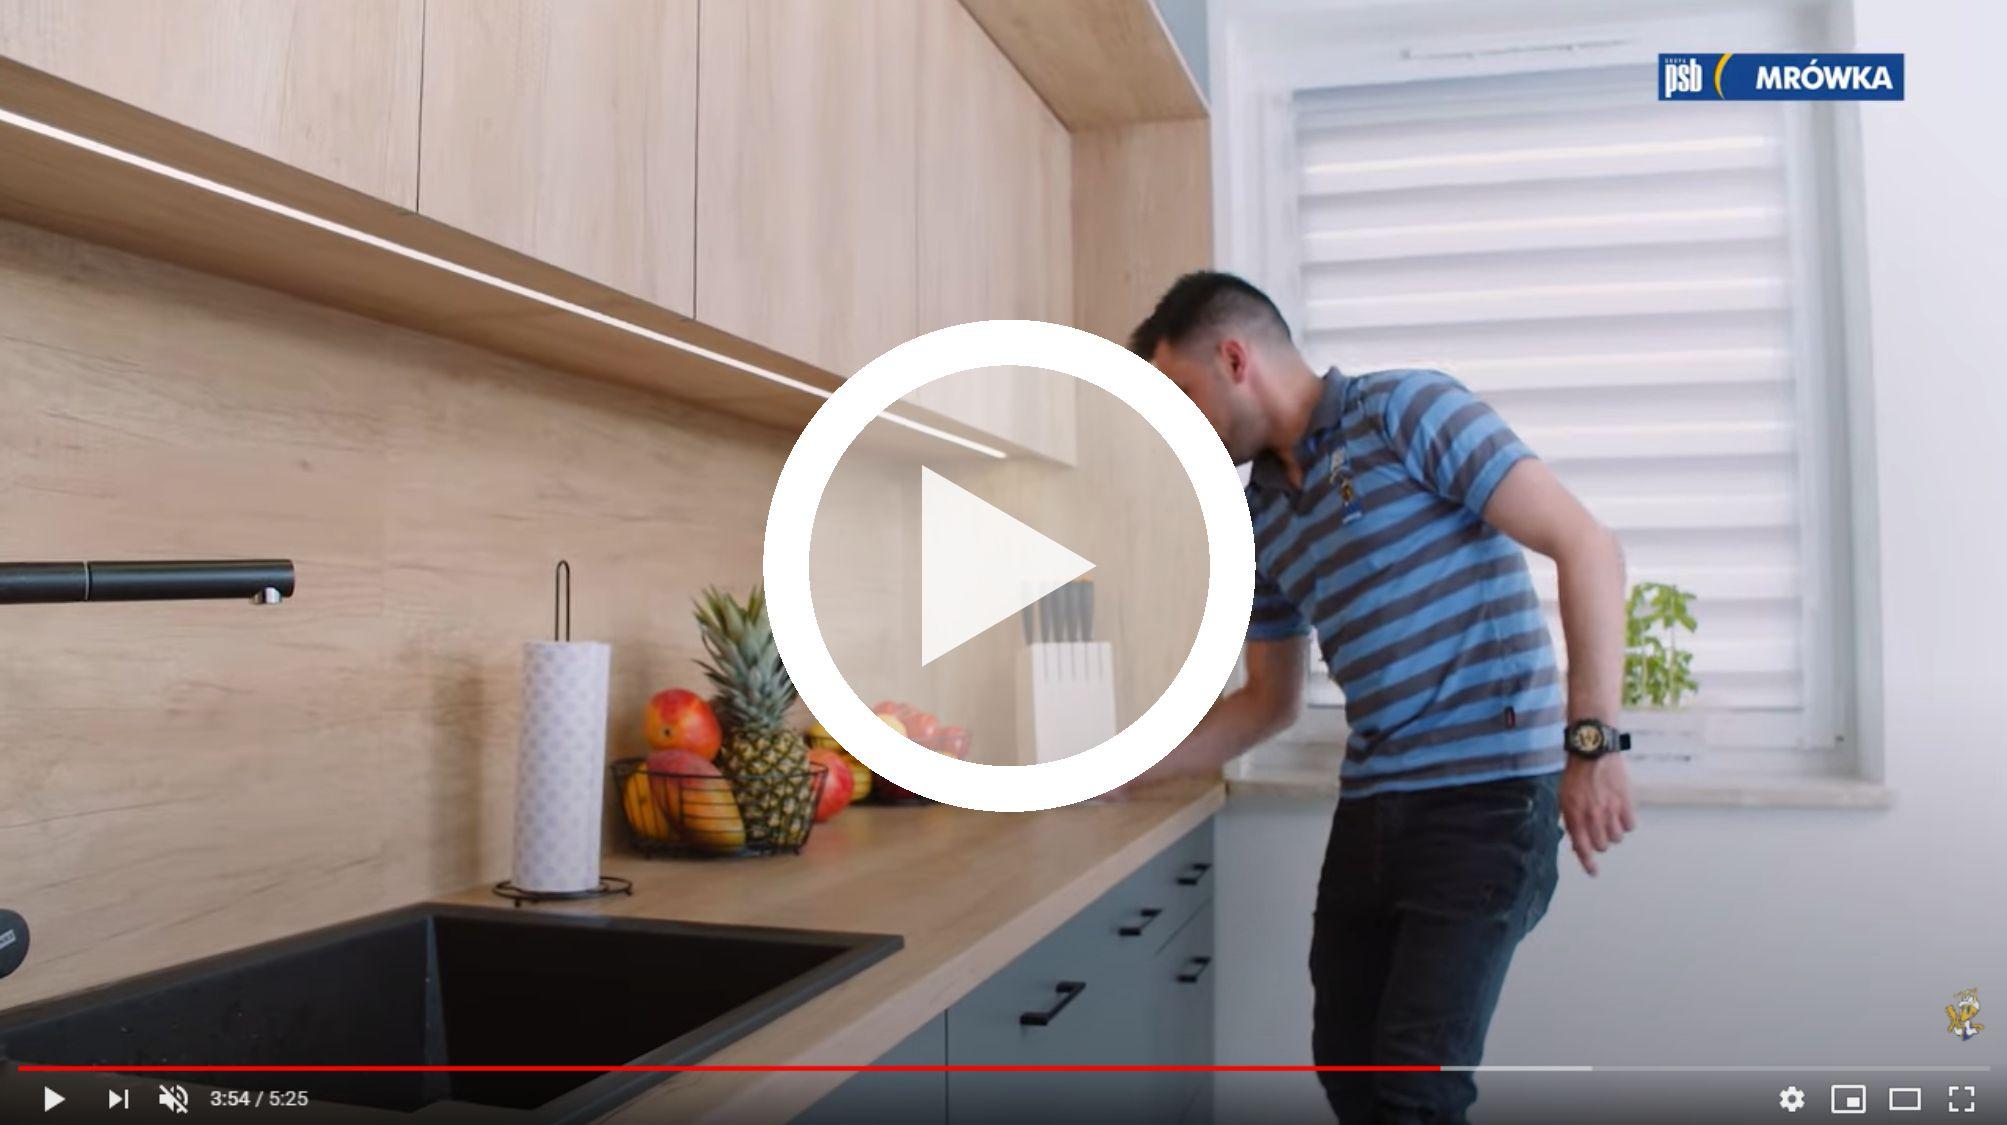 porzadki-w-kuchni-z-produktami-marki-stella